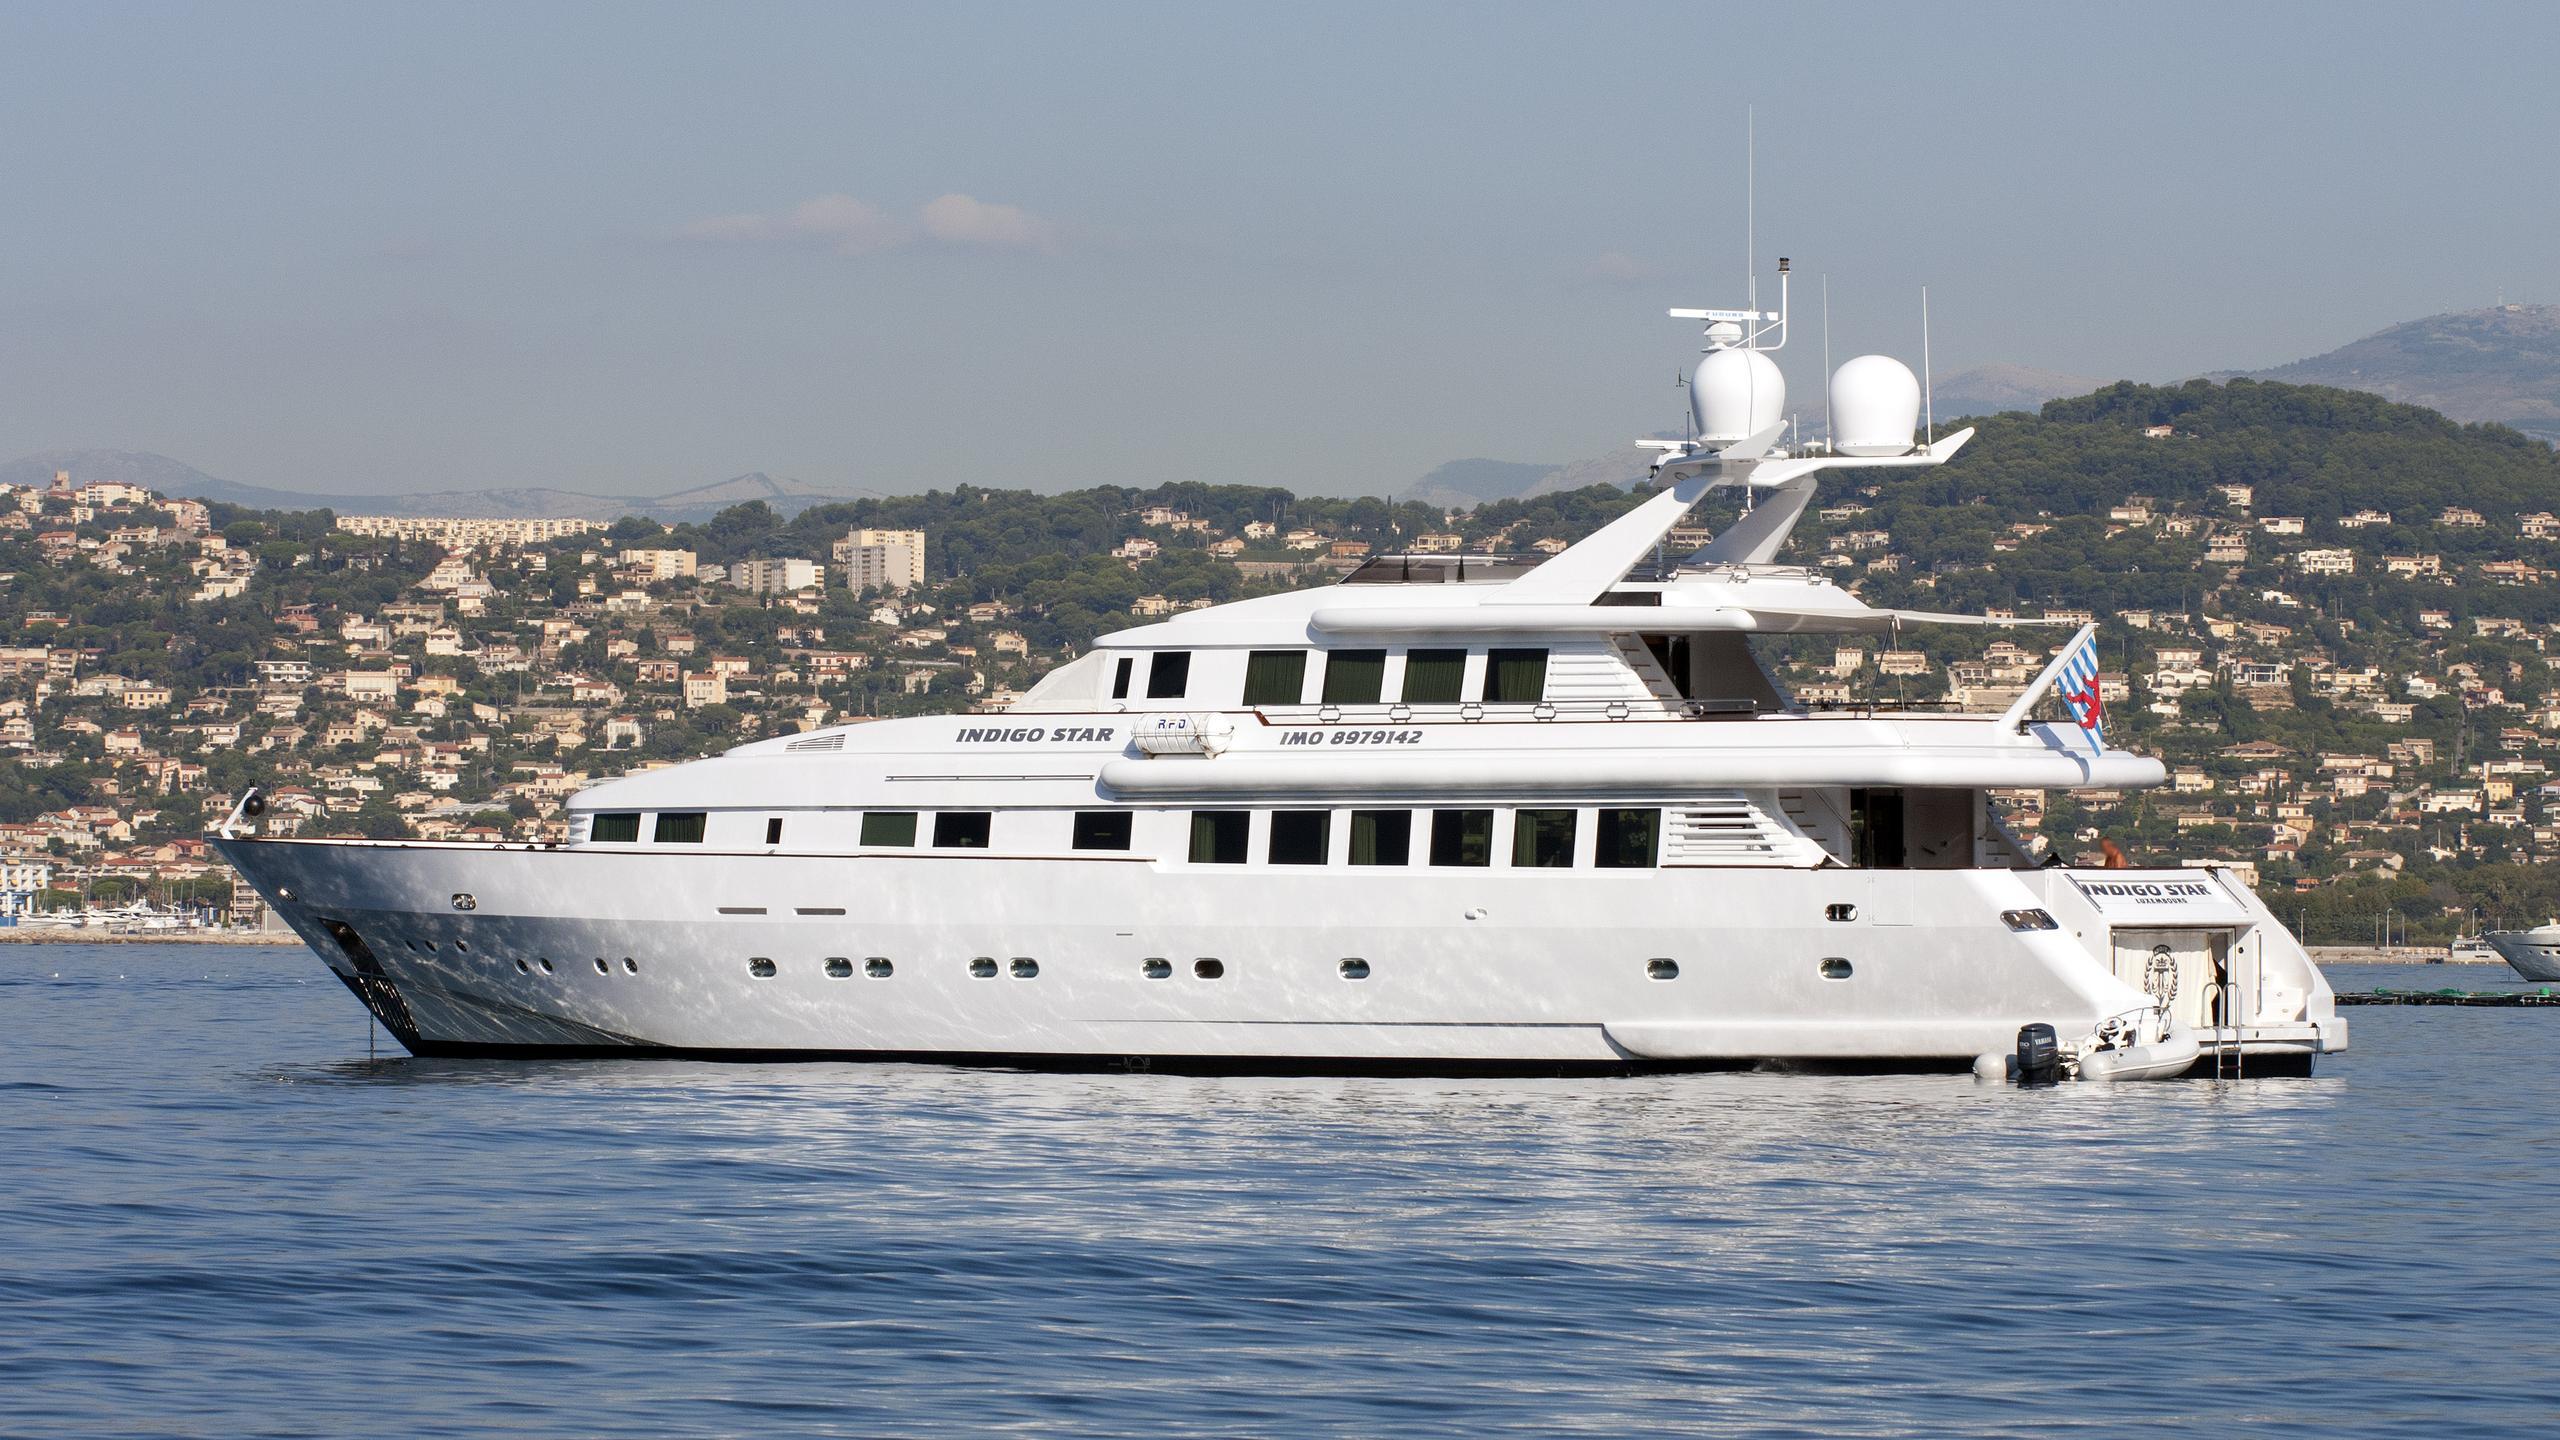 indigo-star-motor-yacht-siar-moschini-sm-38-my-1995-38m-profile